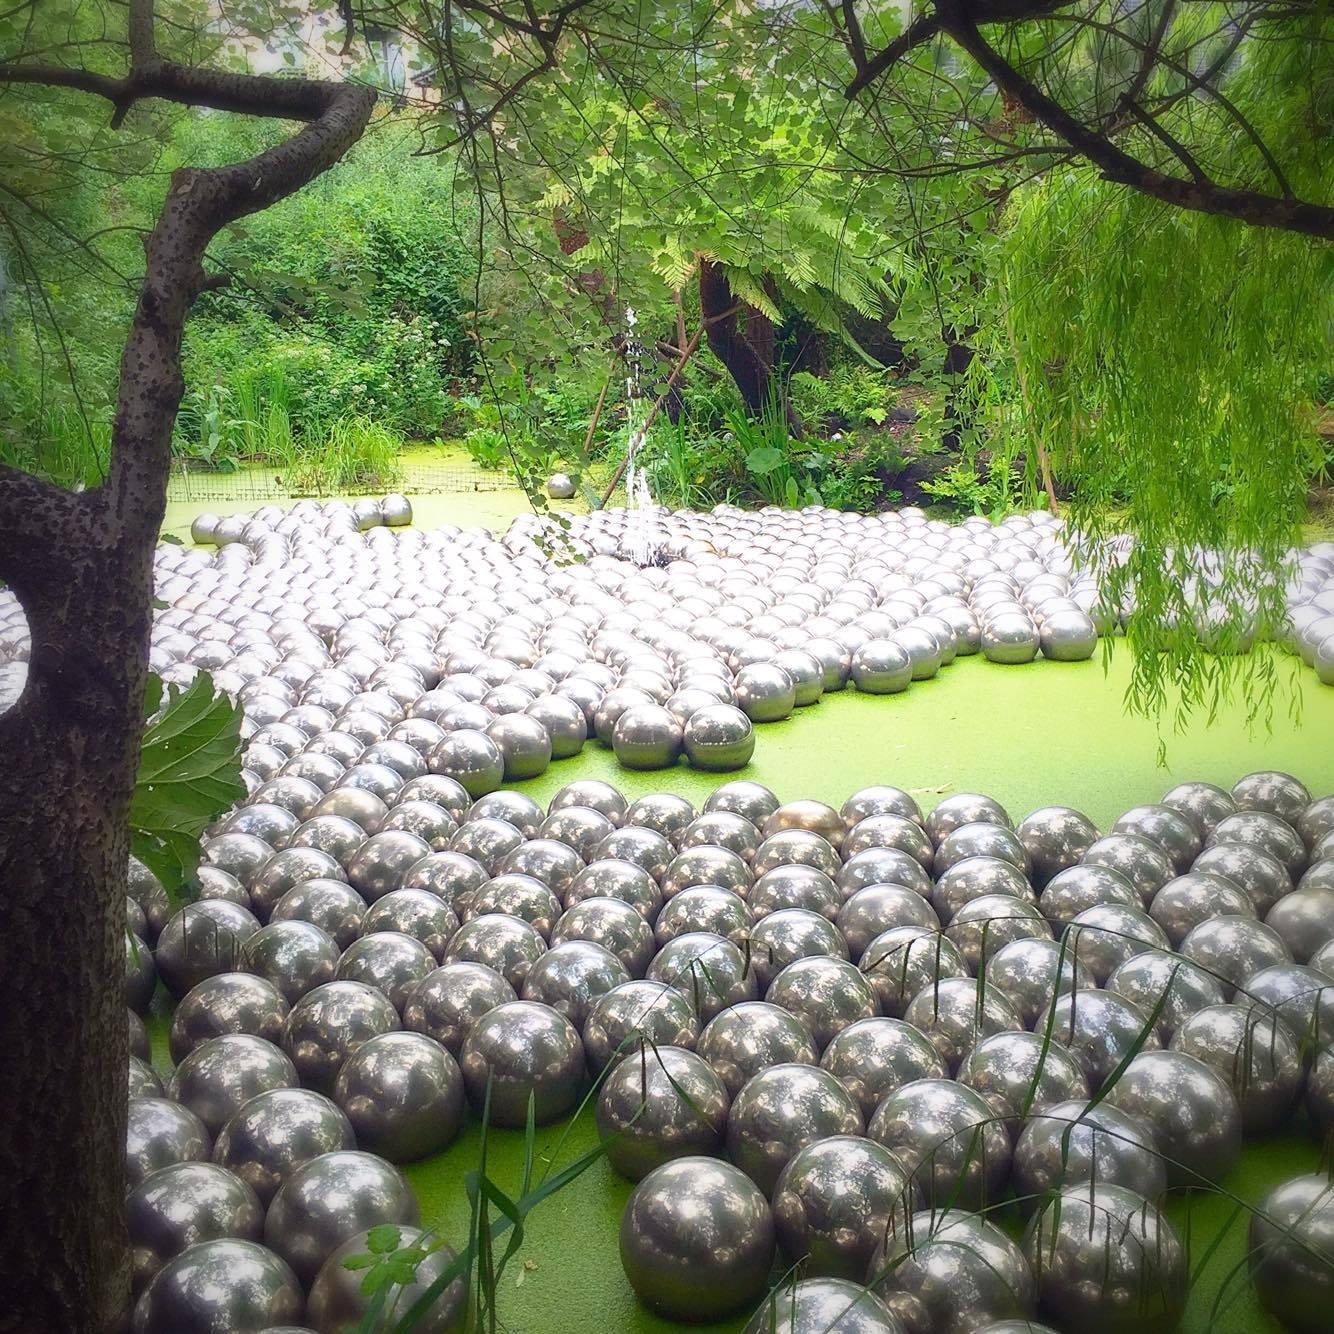 Narcissus Garden Waterfront Garden Victoria Miro Yayoi Kusama